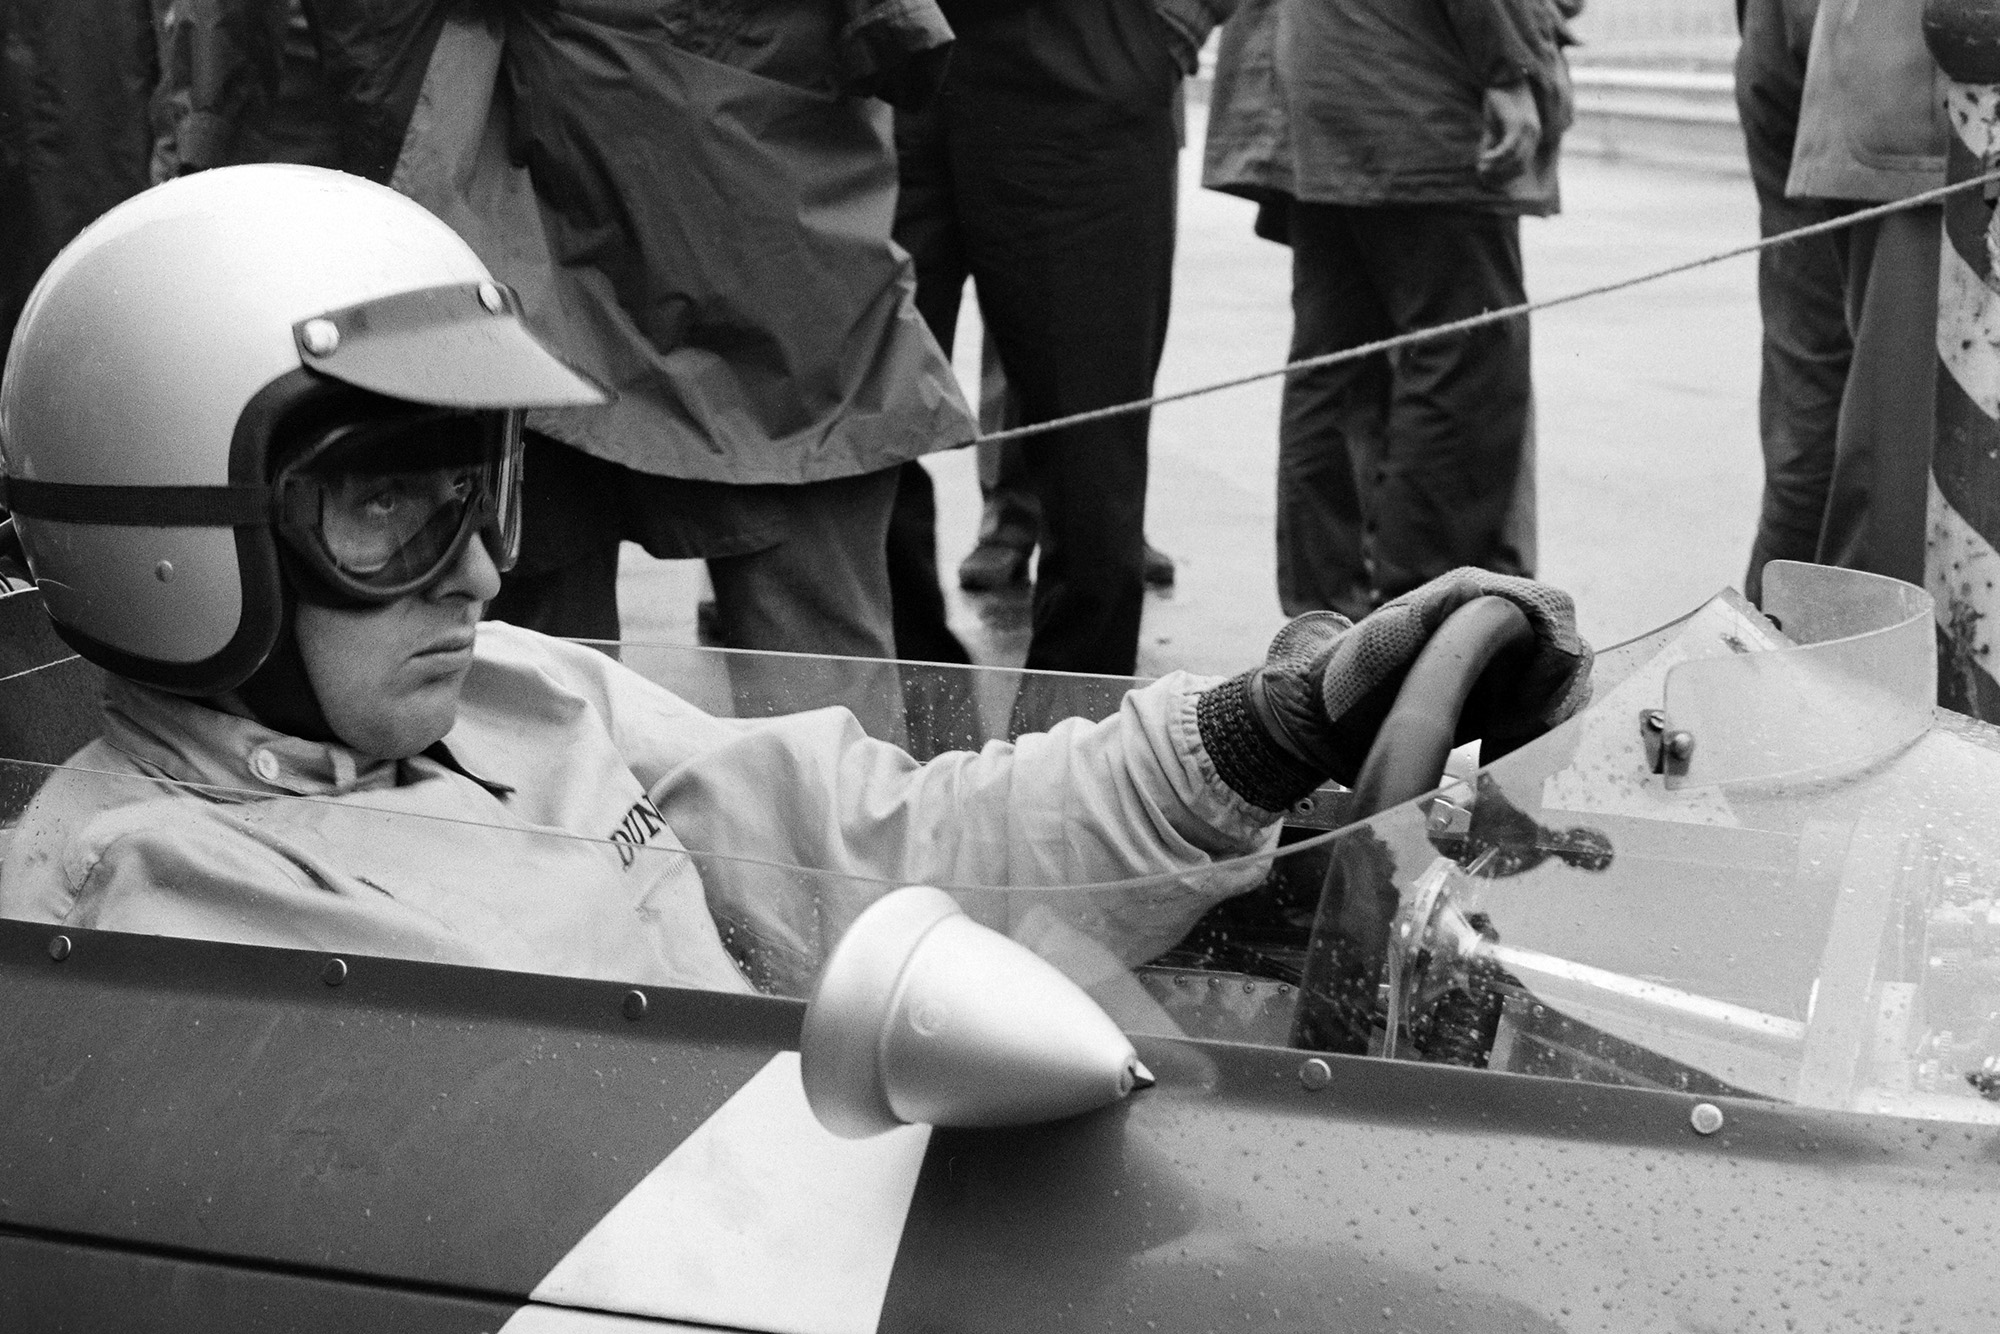 Ferrari's Lorenzo Bandini prepares for the race start.